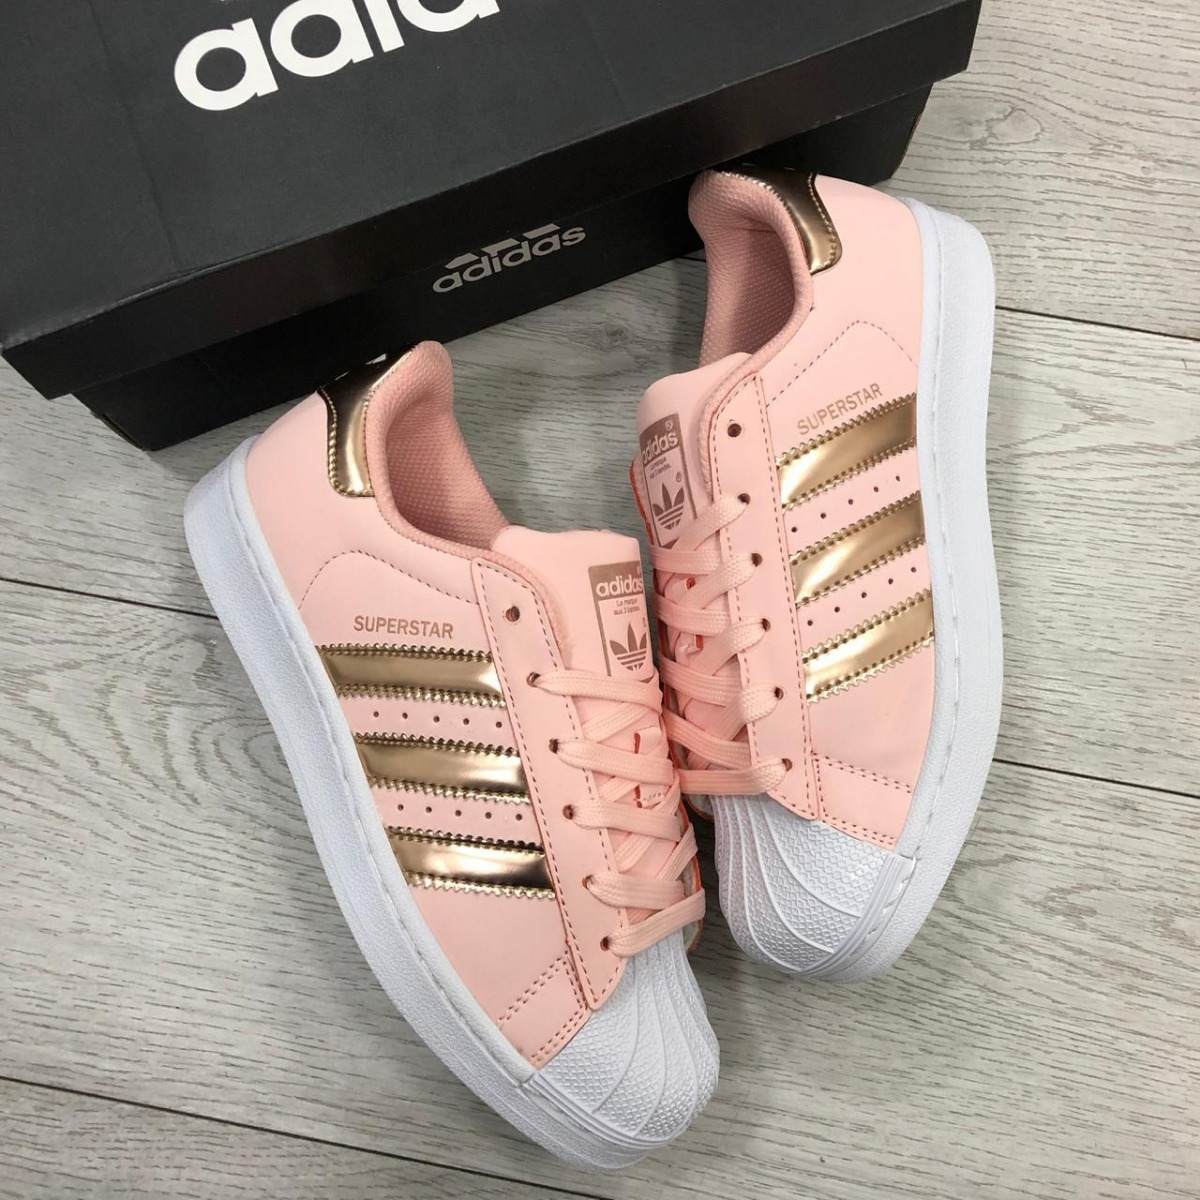 d79c54d5800 Tenis adidas Superstar Pink Mujer -   155.000 en Mercado Libre